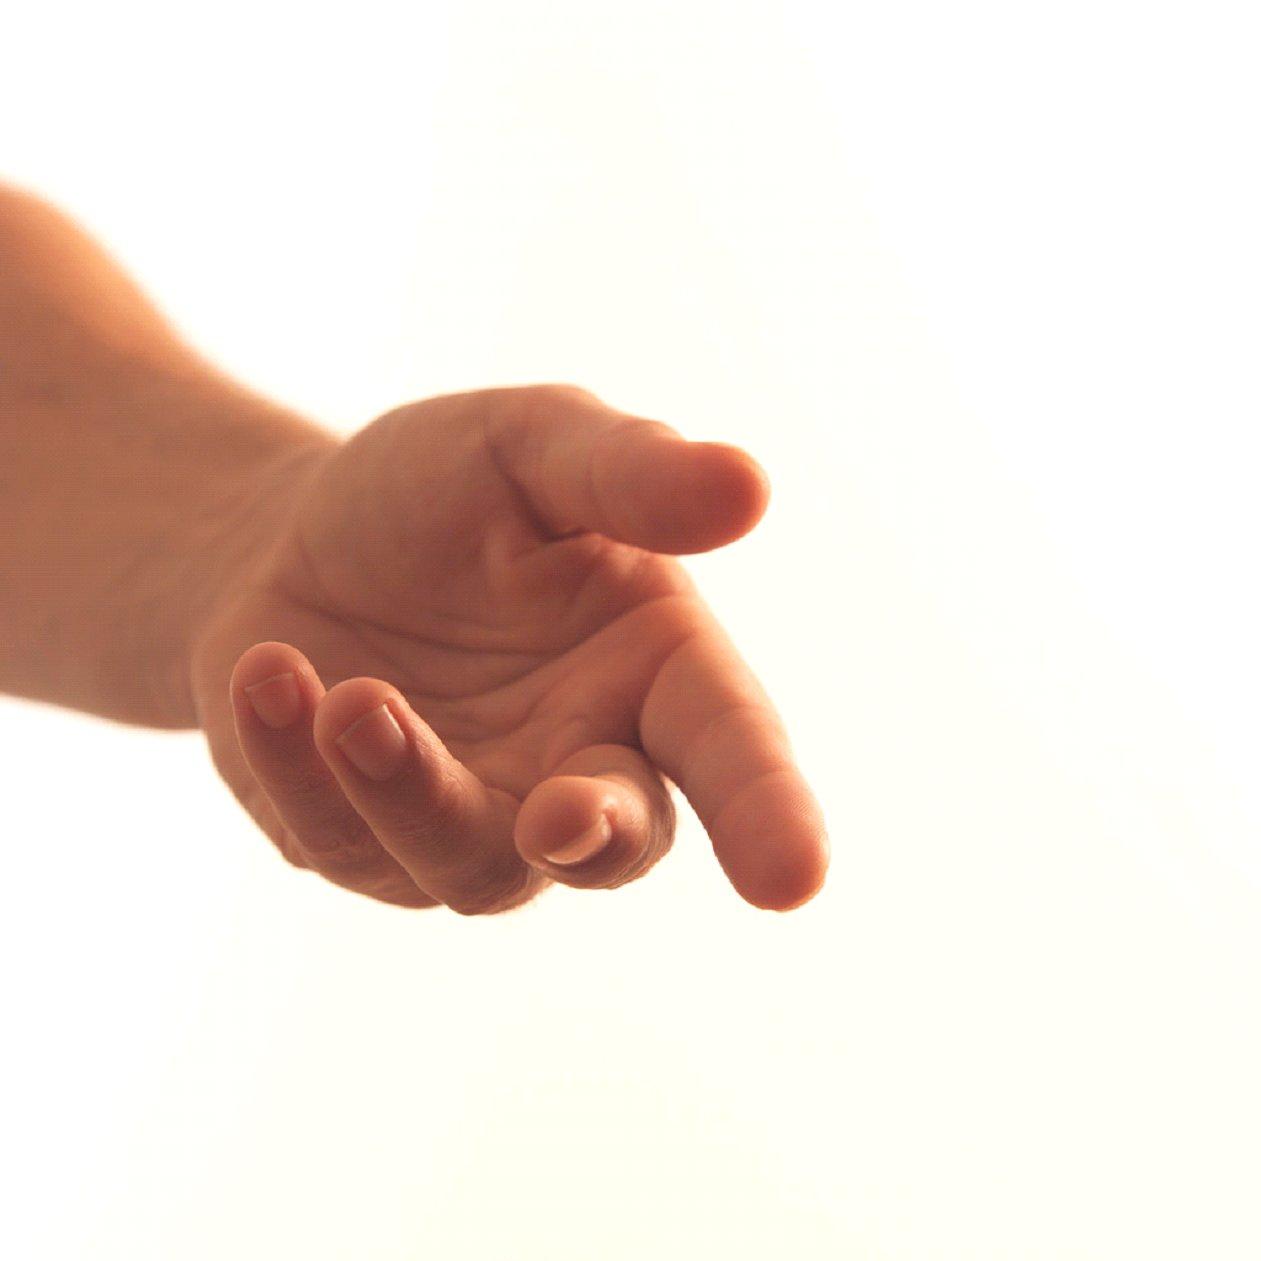 http://digitalhadith.com/Pictures/2012/09/donation.jpg